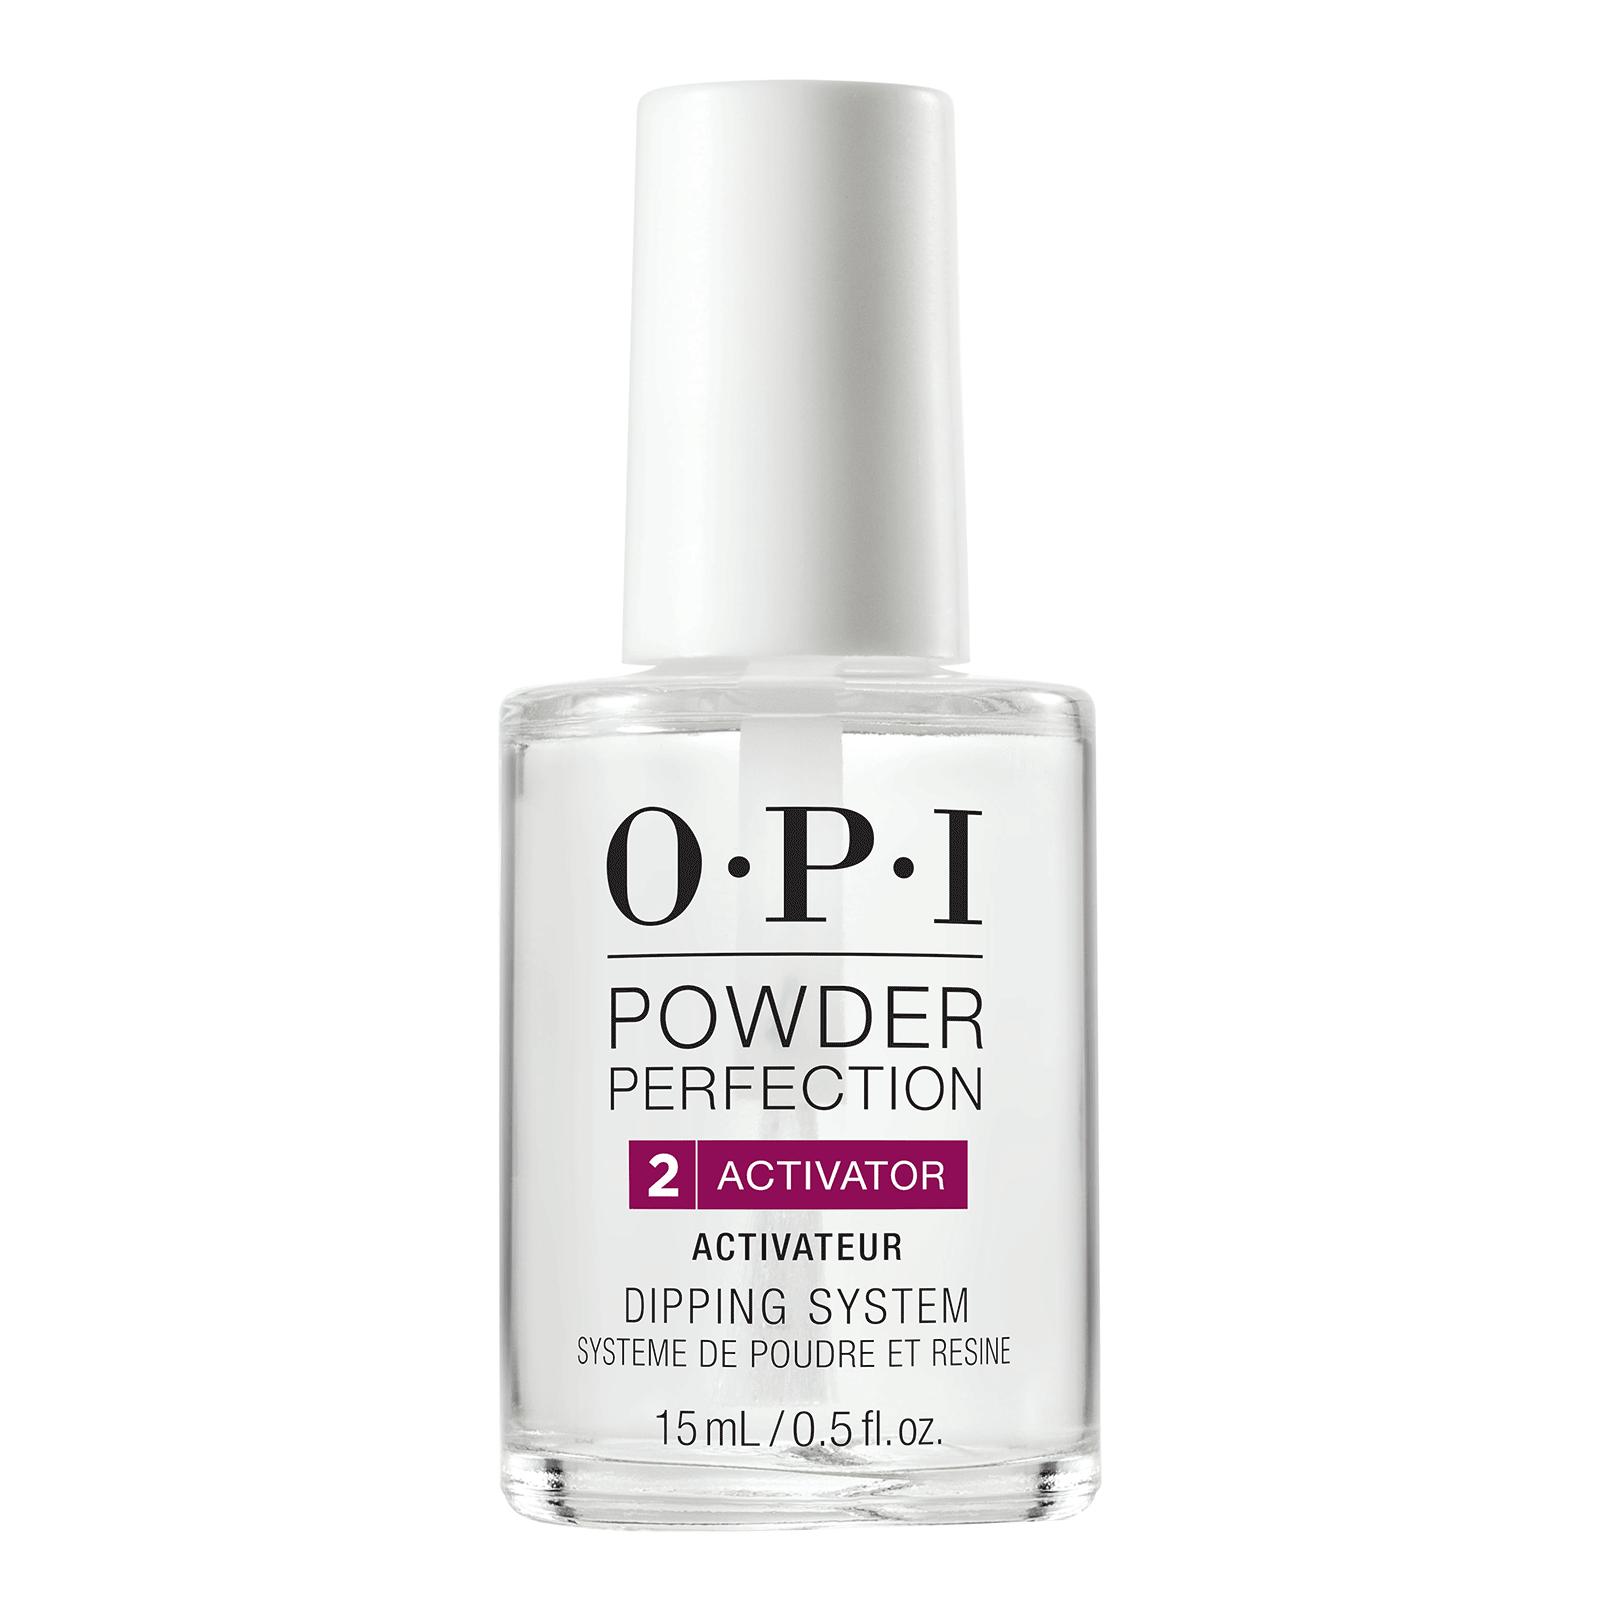 Opi Powder Nail Polish Kit: Powder Perfection Liquids Essentials Kit - OPI